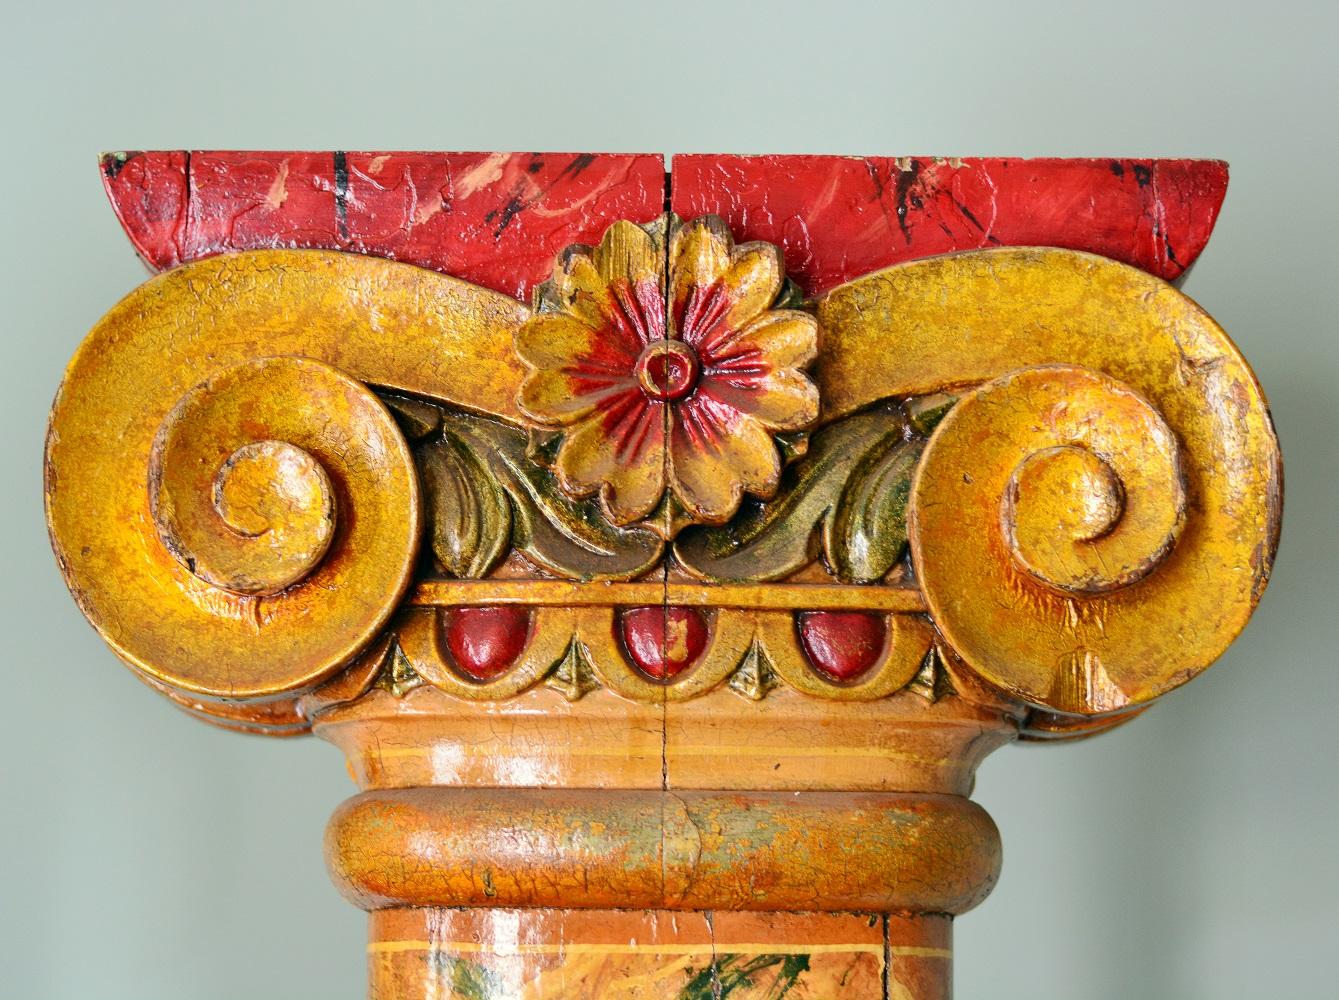 Detail of fairground column, 74677, £2950.00 at LASSCO Brunswick House